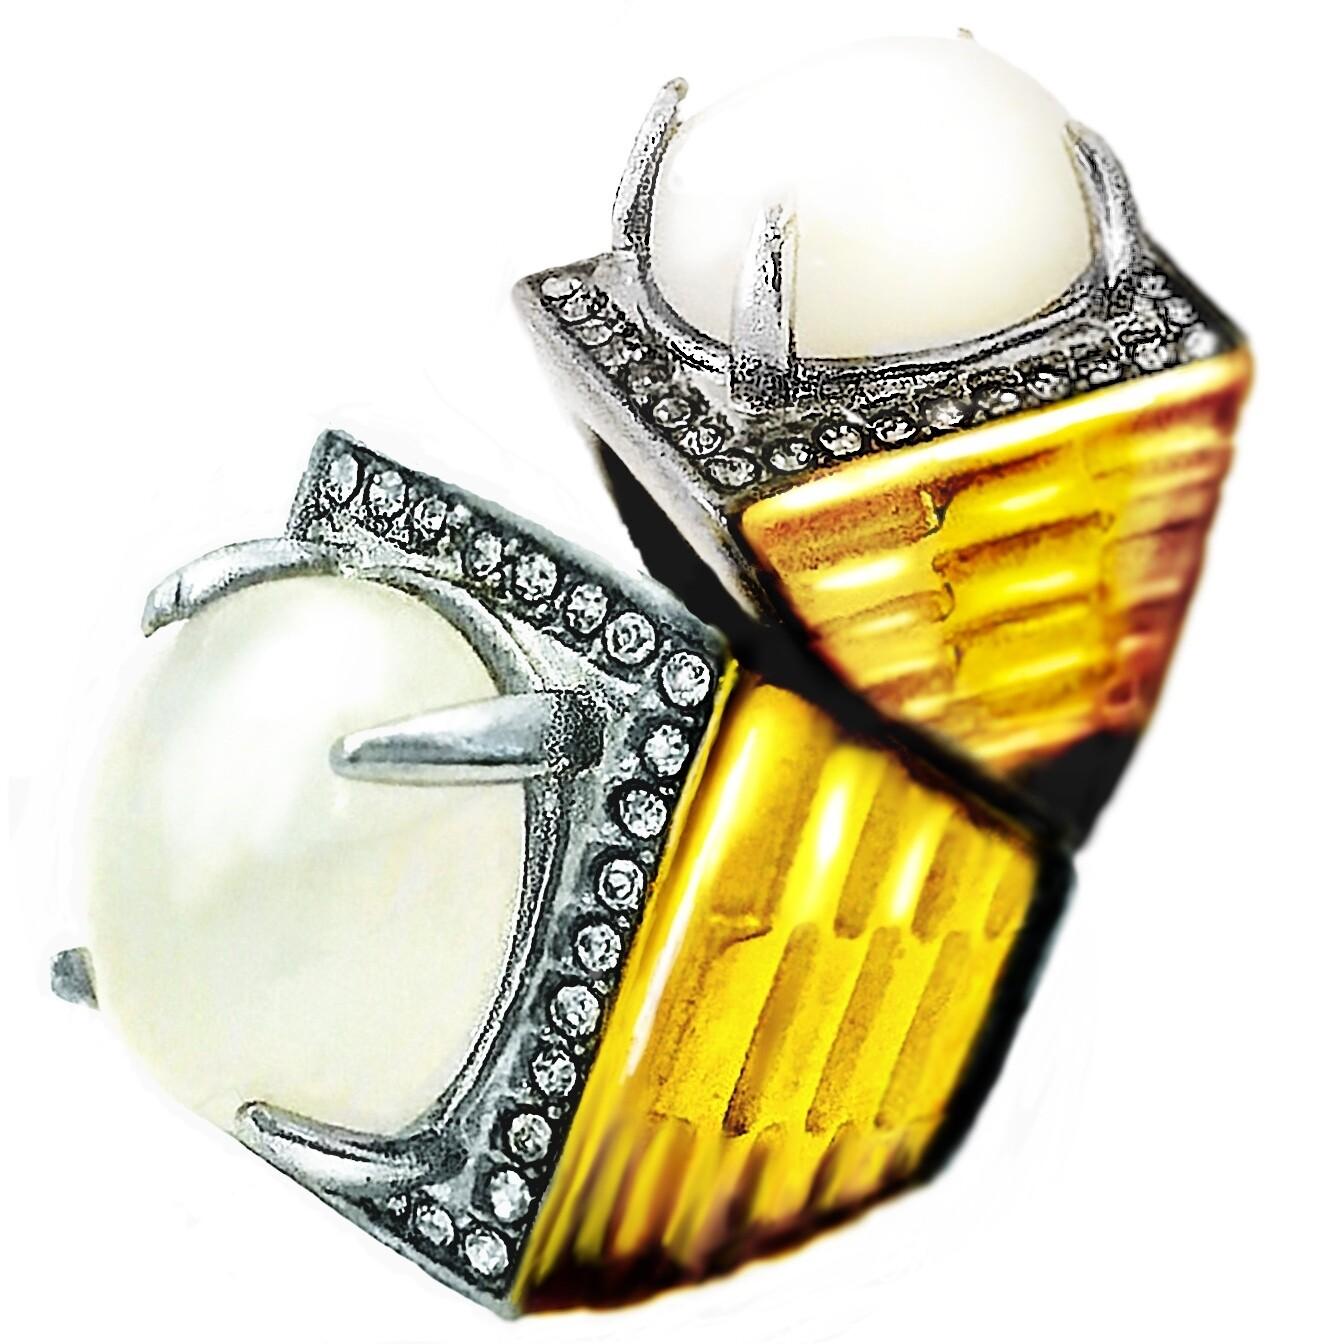 Magic Moonstone Jewel Ring, possessing Spiritual Qualities, ensuring Successful Progress